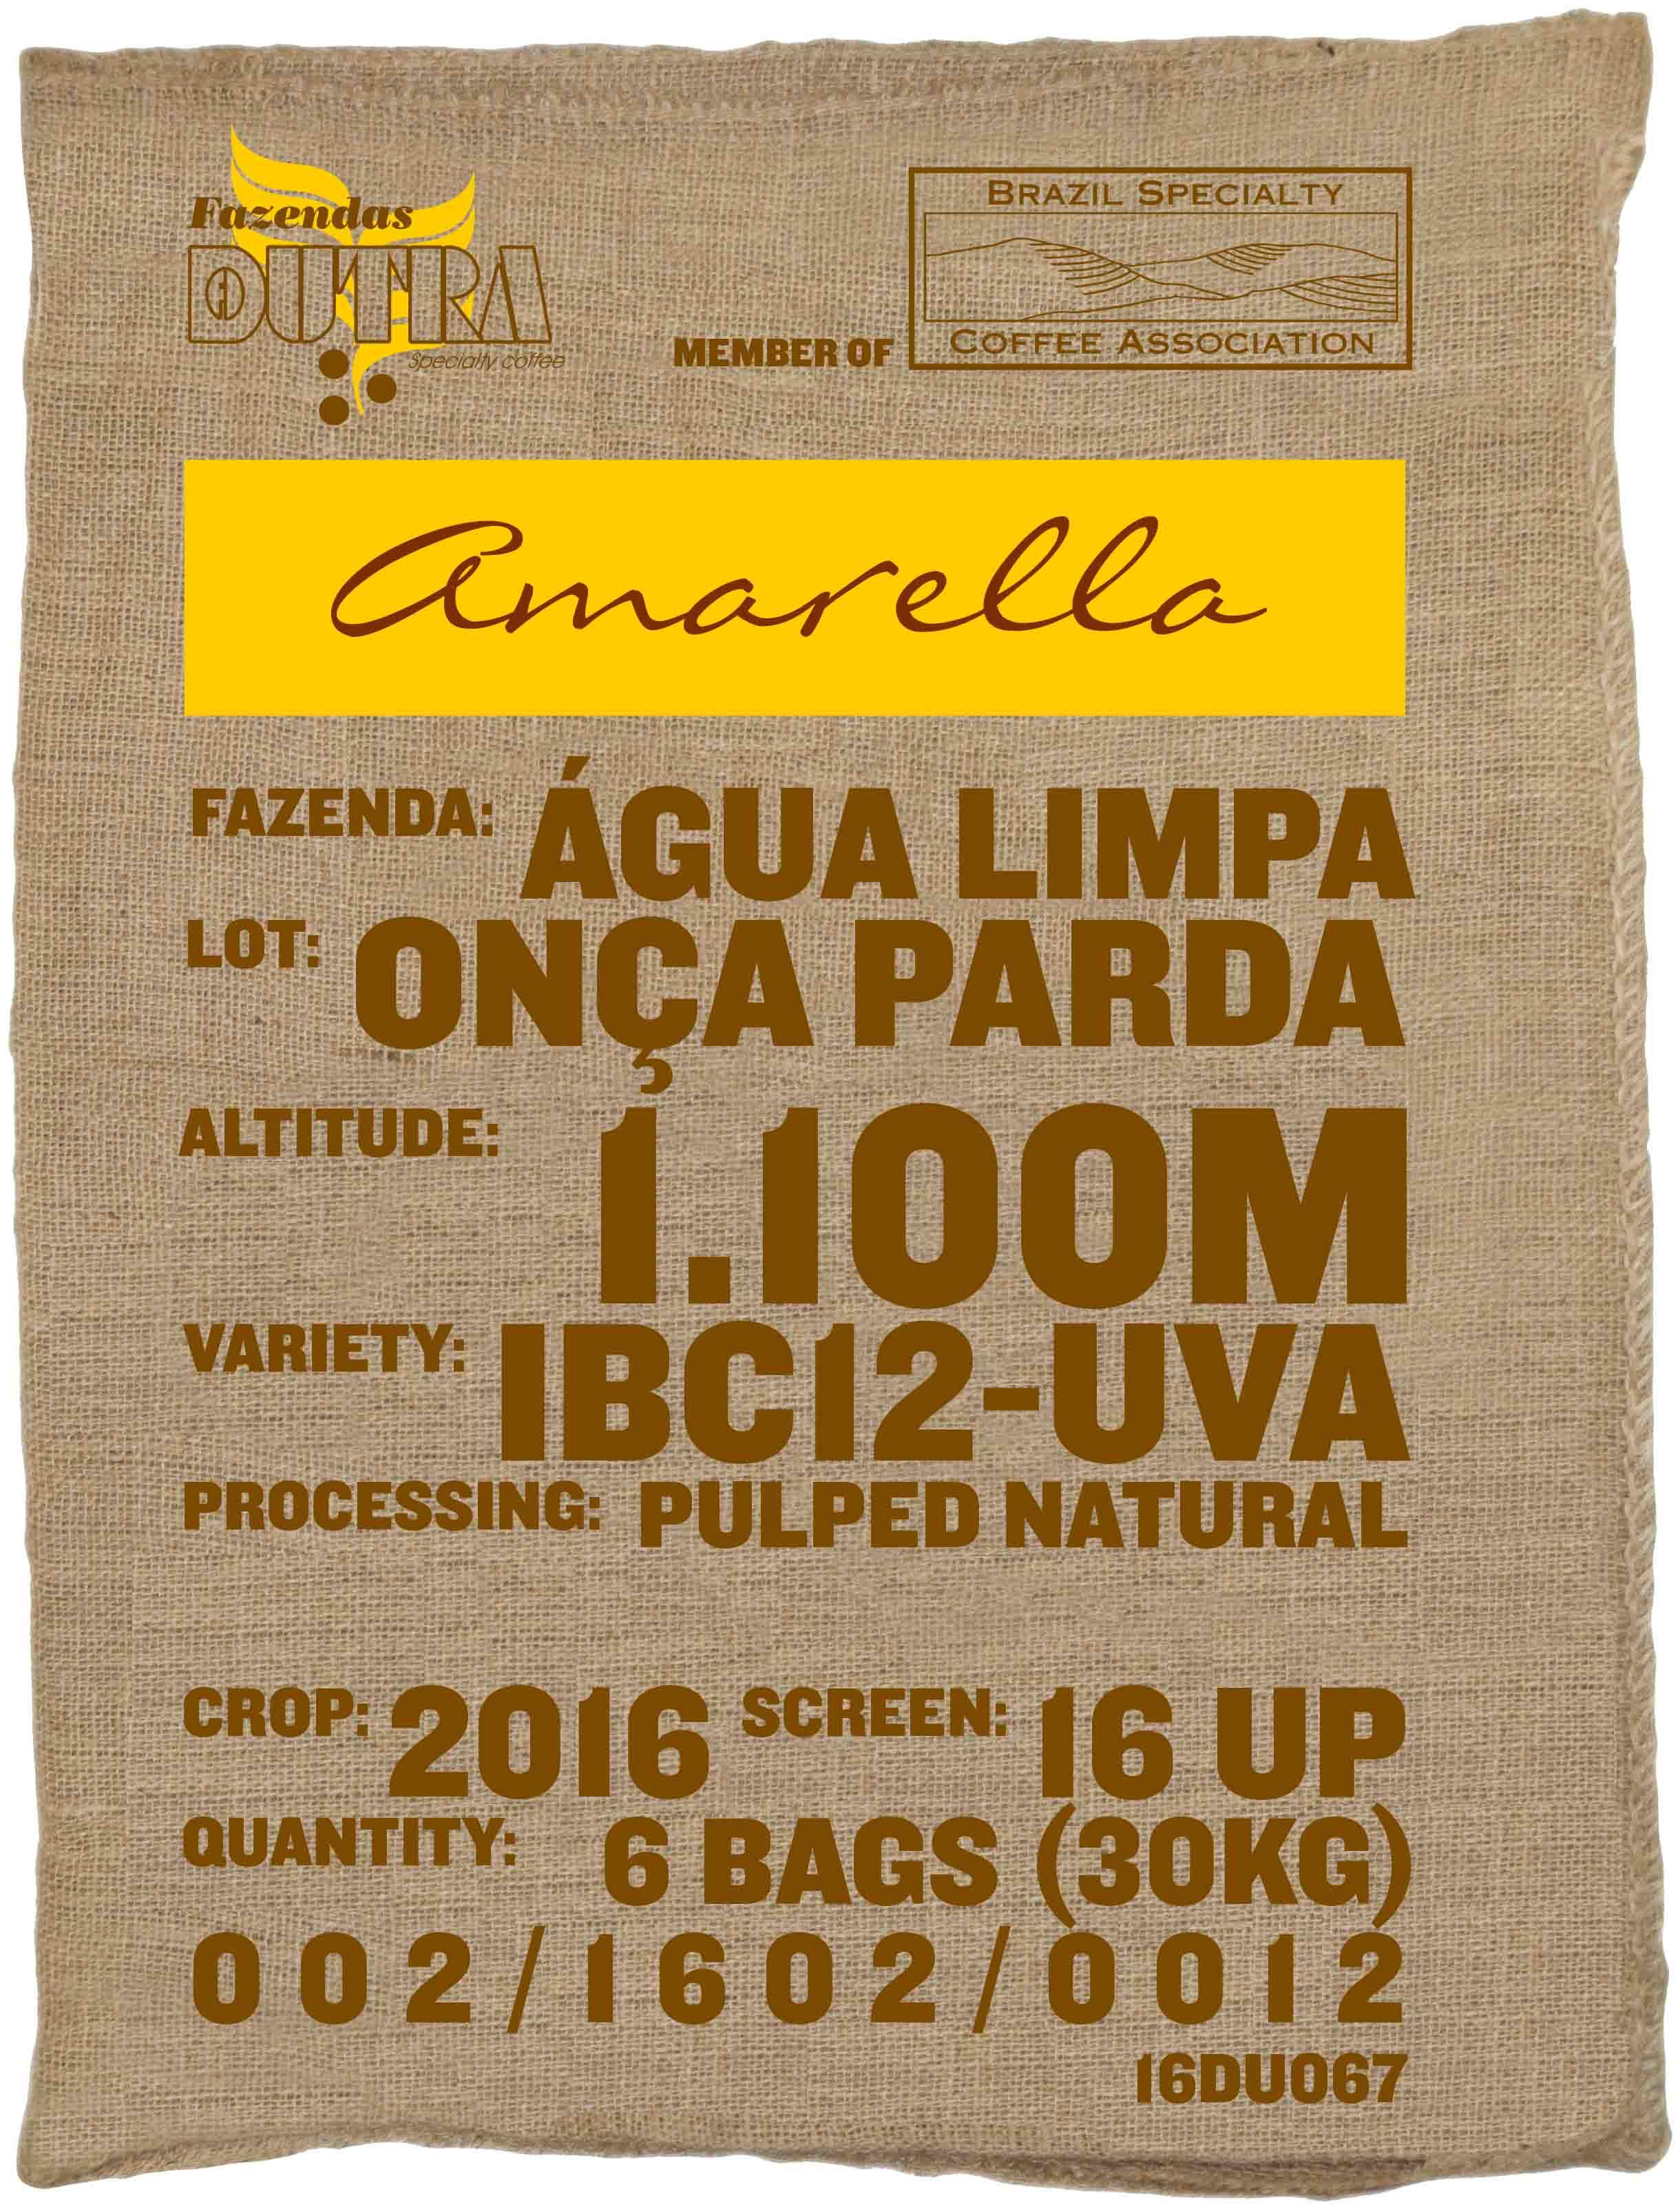 Ein Rohkaffeesack amarella Parzellenkaffee Varietät IBC12-UVA. Fazendas Dutra Lot Onca Parda.